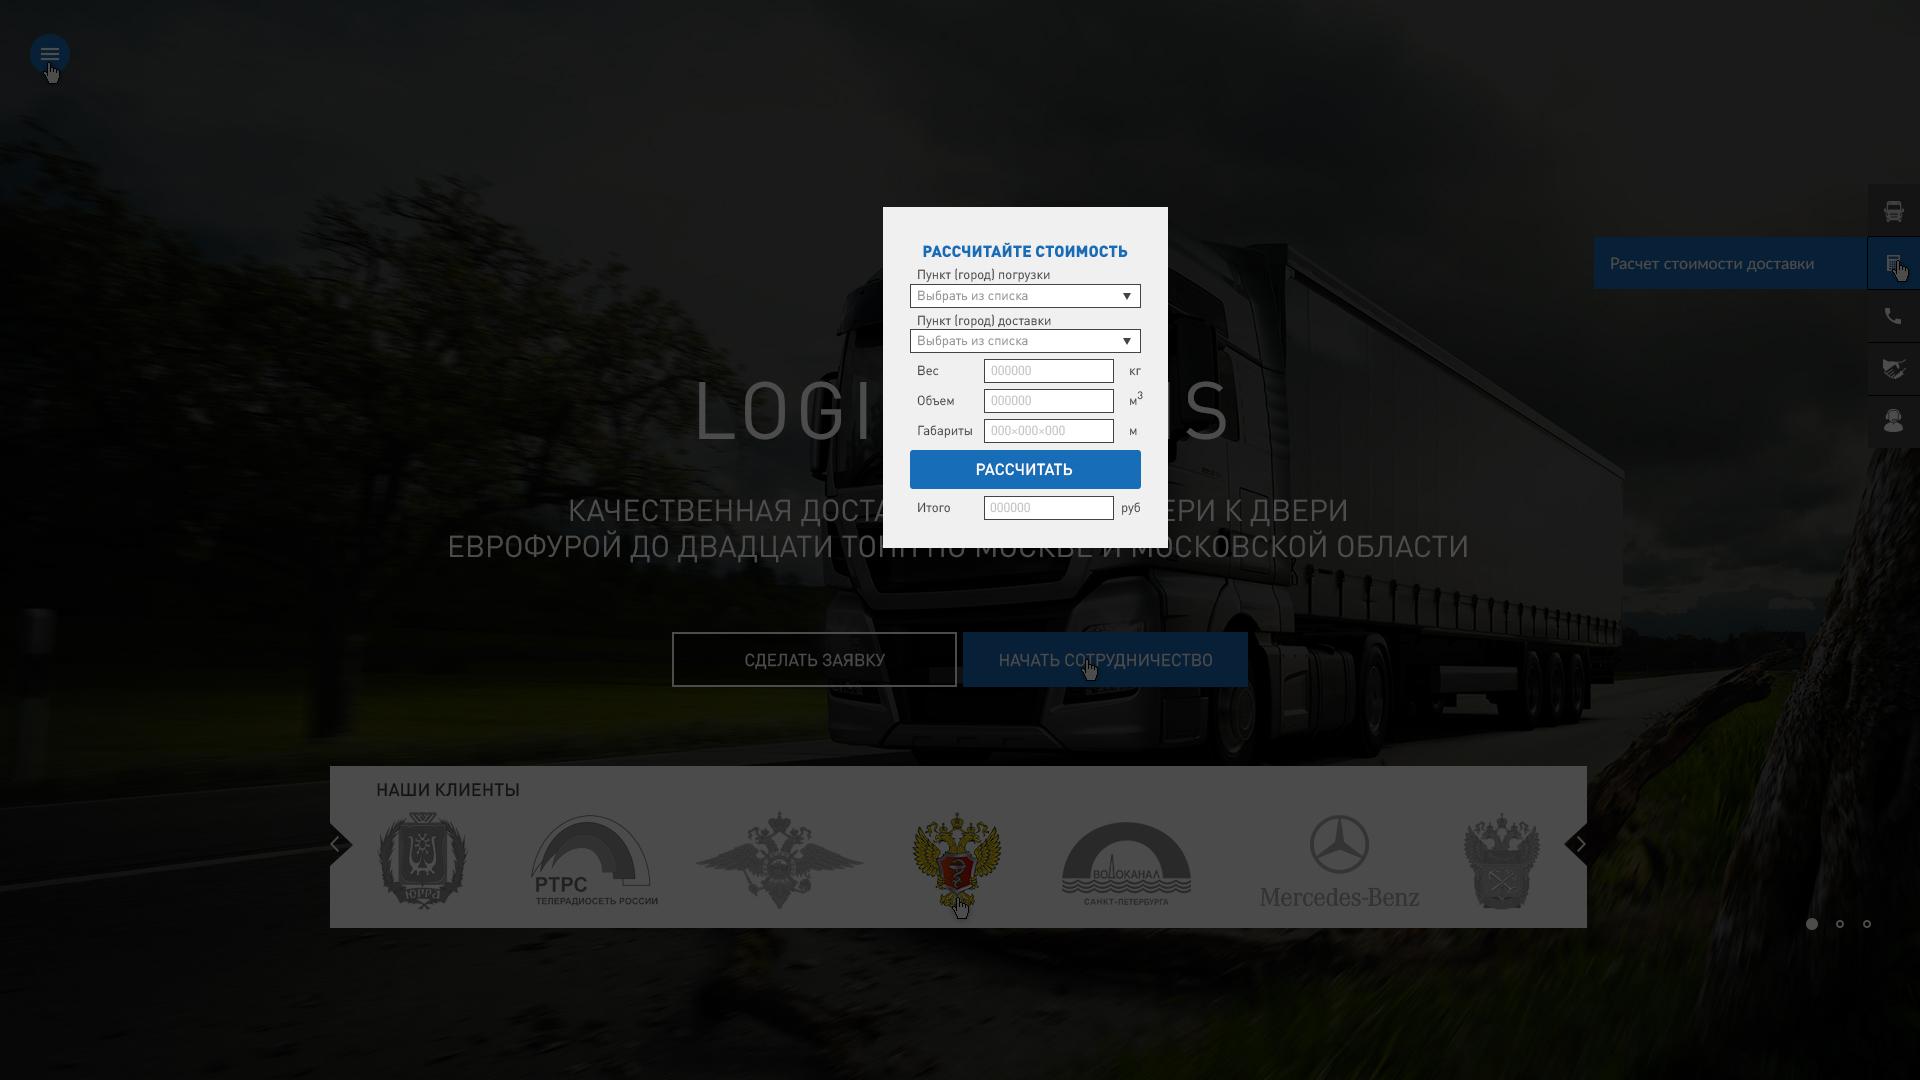 Дизайн сайта транспортно-экспедиторской компании ЛогикТранс фото f_7605a45bb9fd6813.jpg